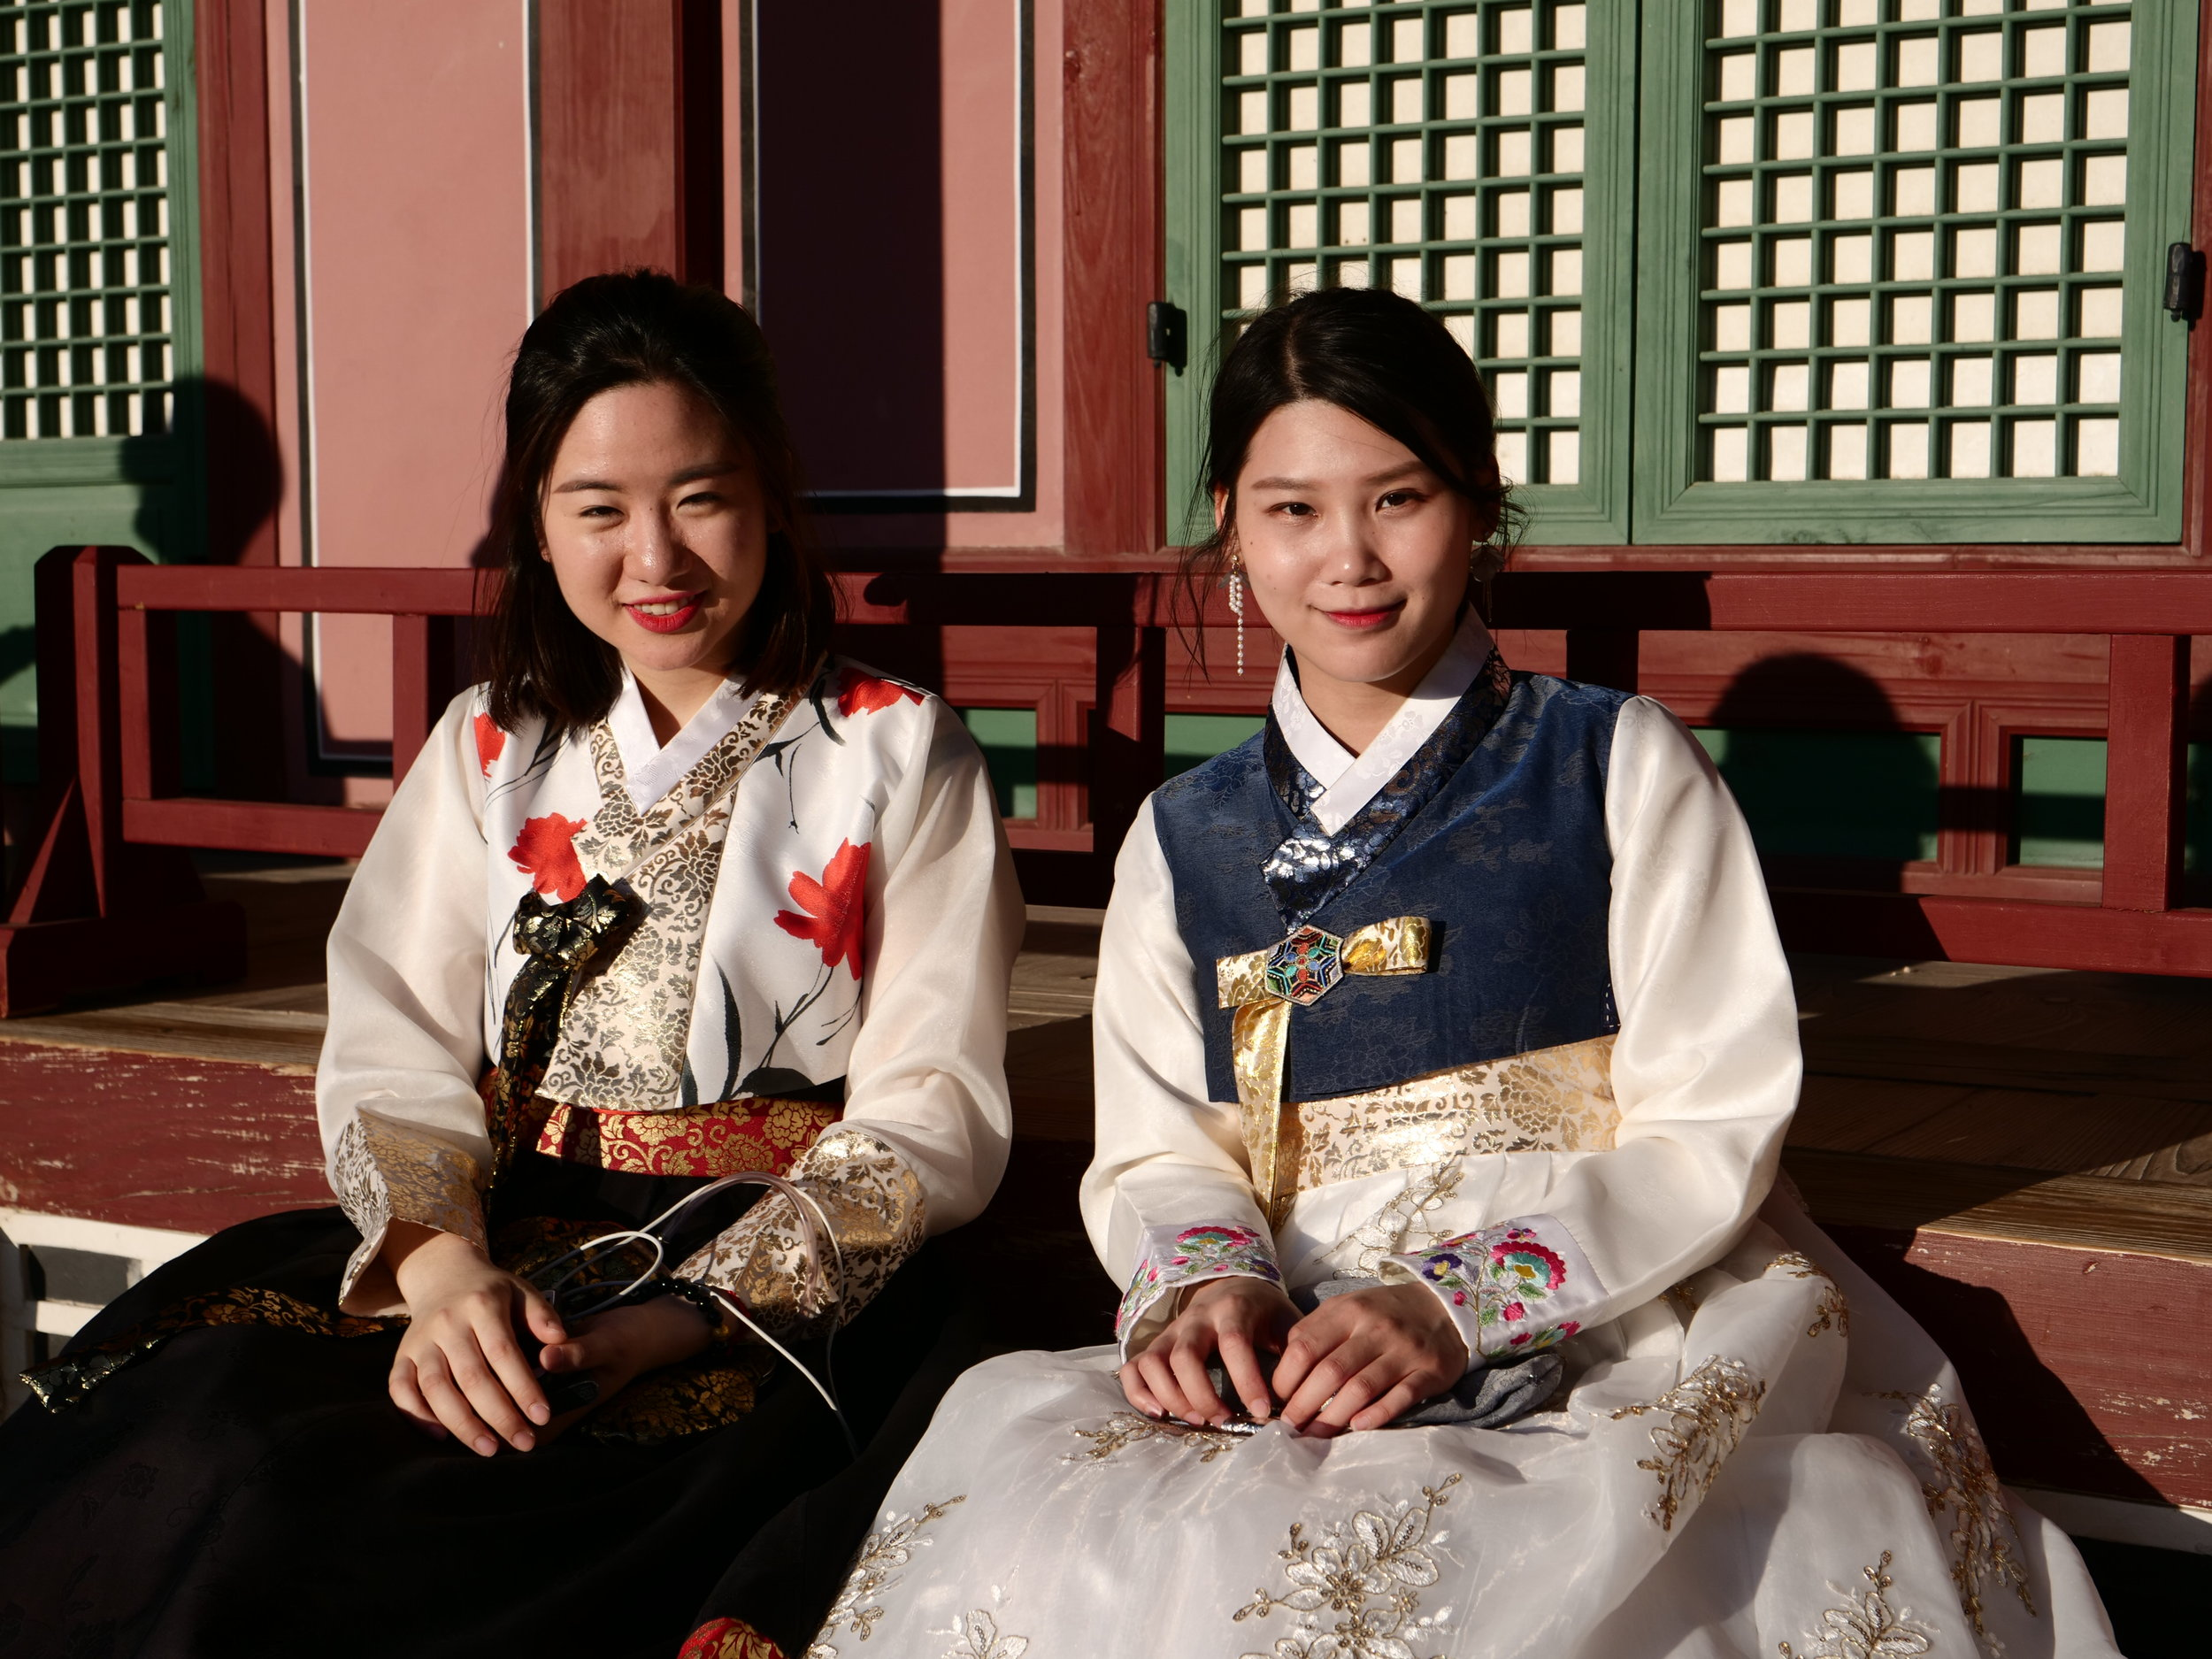 Korean women in traditional dresses